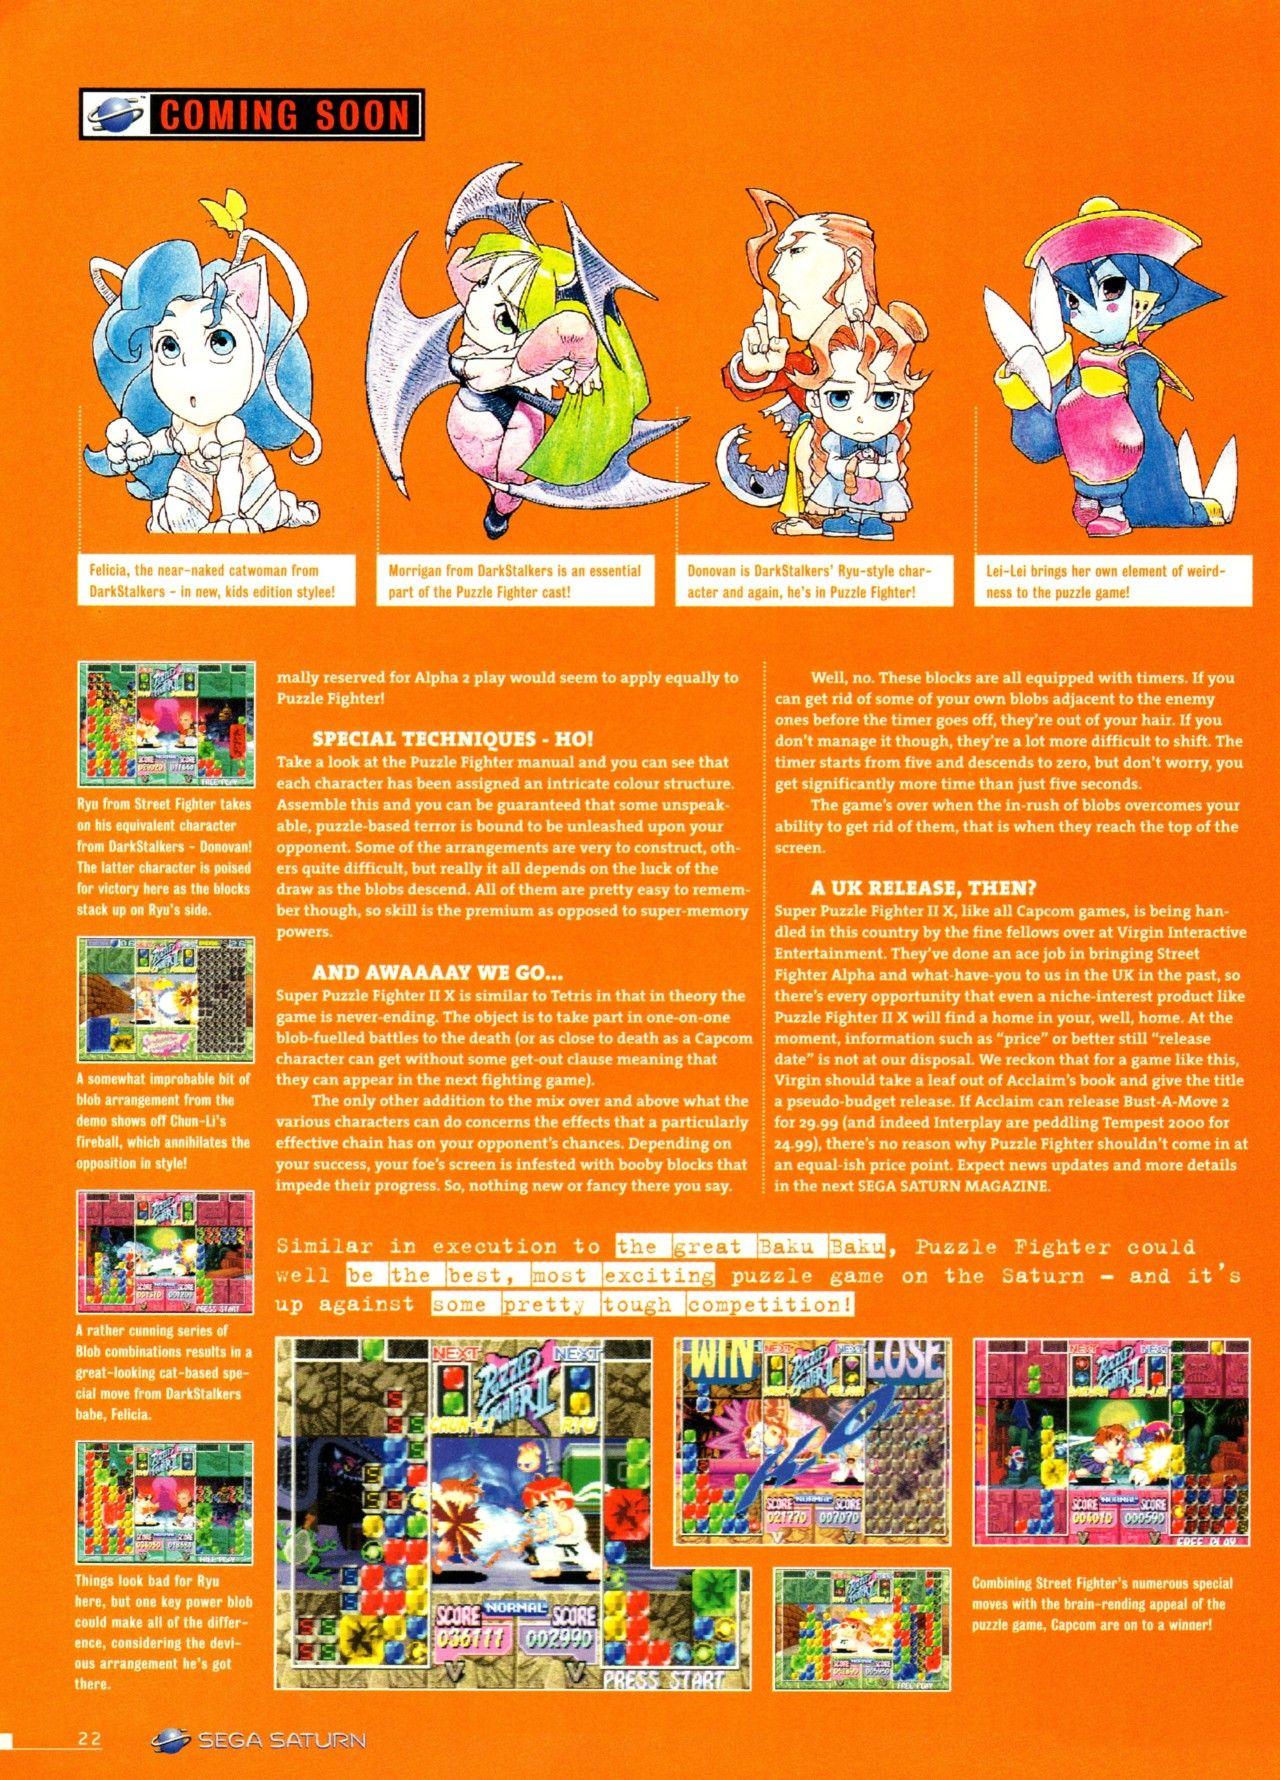 Sega Saturn Magazine #16, February 1997 - Super Puzzle Fighter II Turbo! I love the chibi art.  Follow oldgamemags on Tumblrfor more awesom...